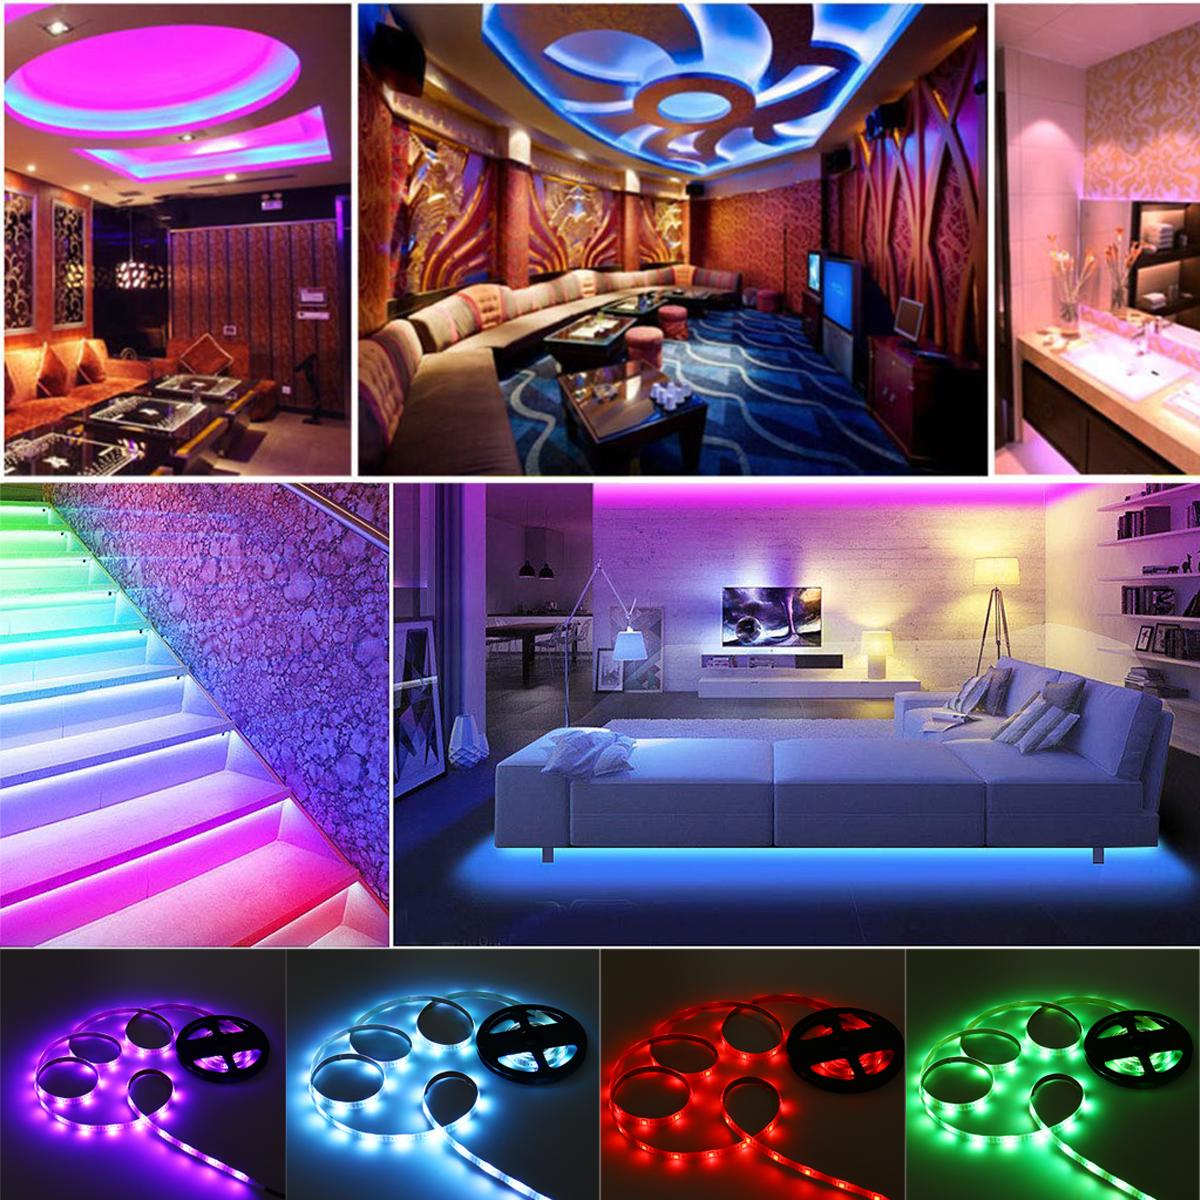 1M 3M 5M 5050 SMD RGB LED Strip Light Voice Wifi Phone Remote Control Home Lighting Decoration DC5V